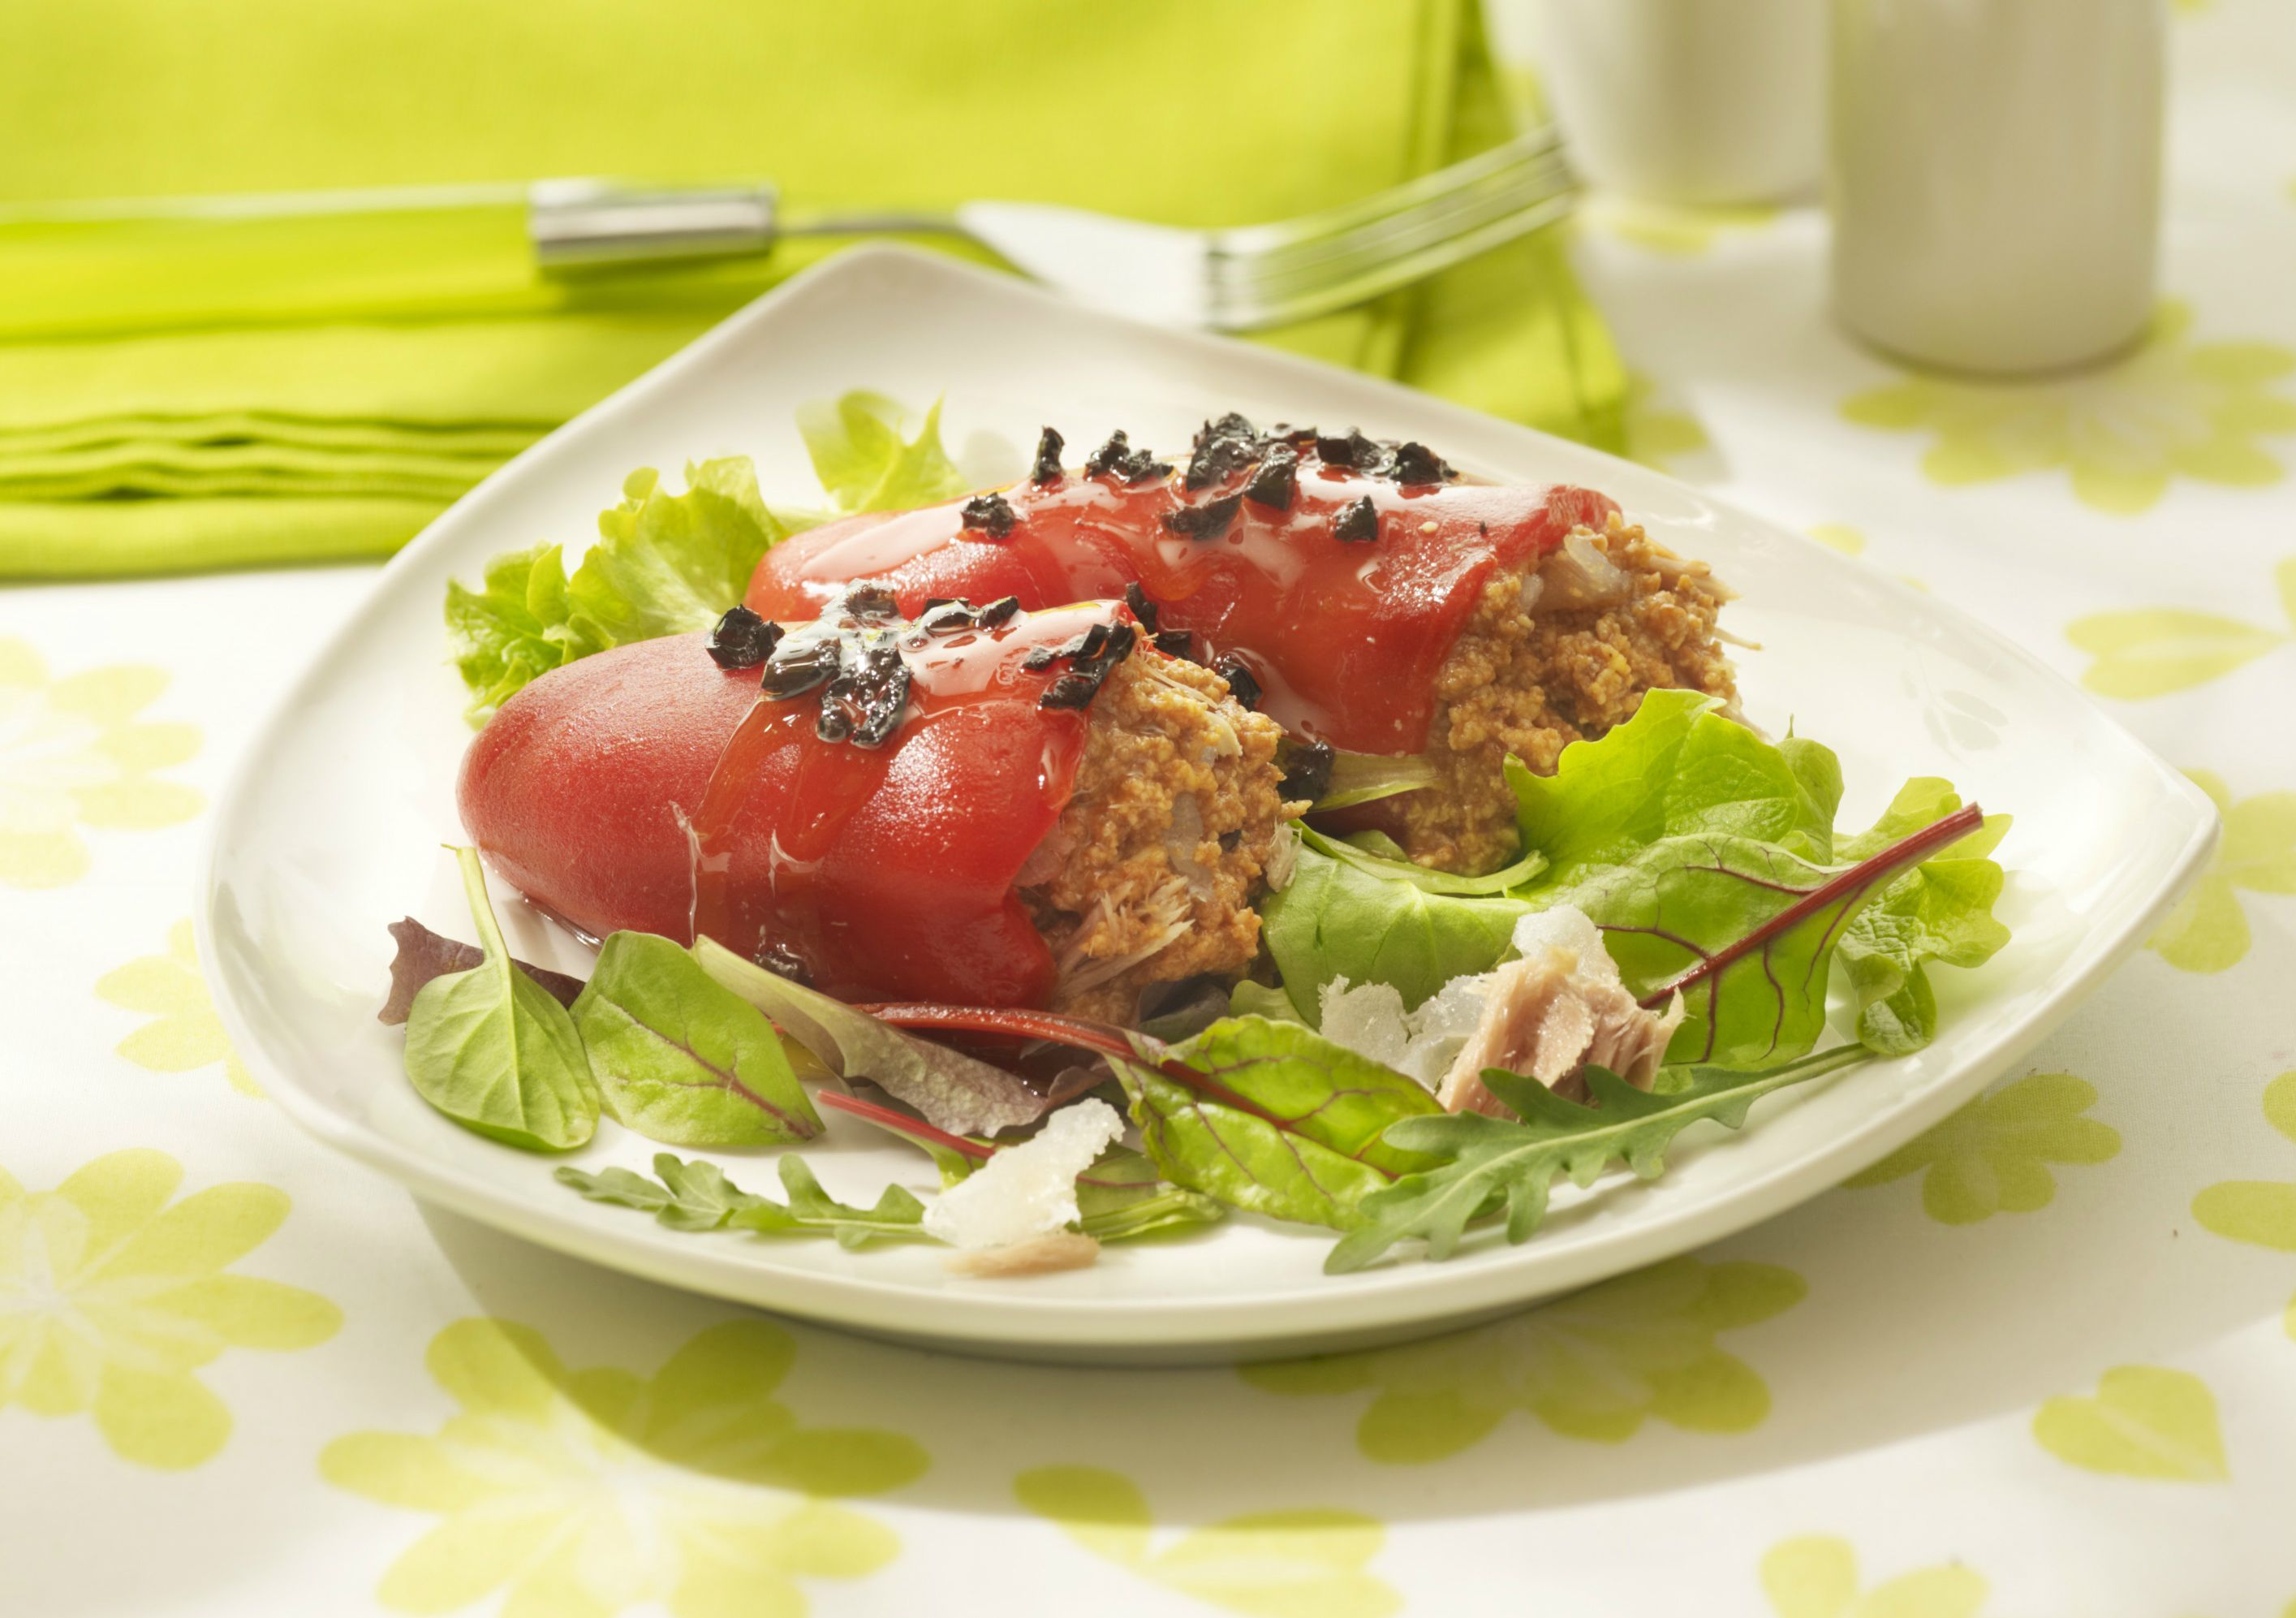 menus to host a parrillada barbecue in spanish